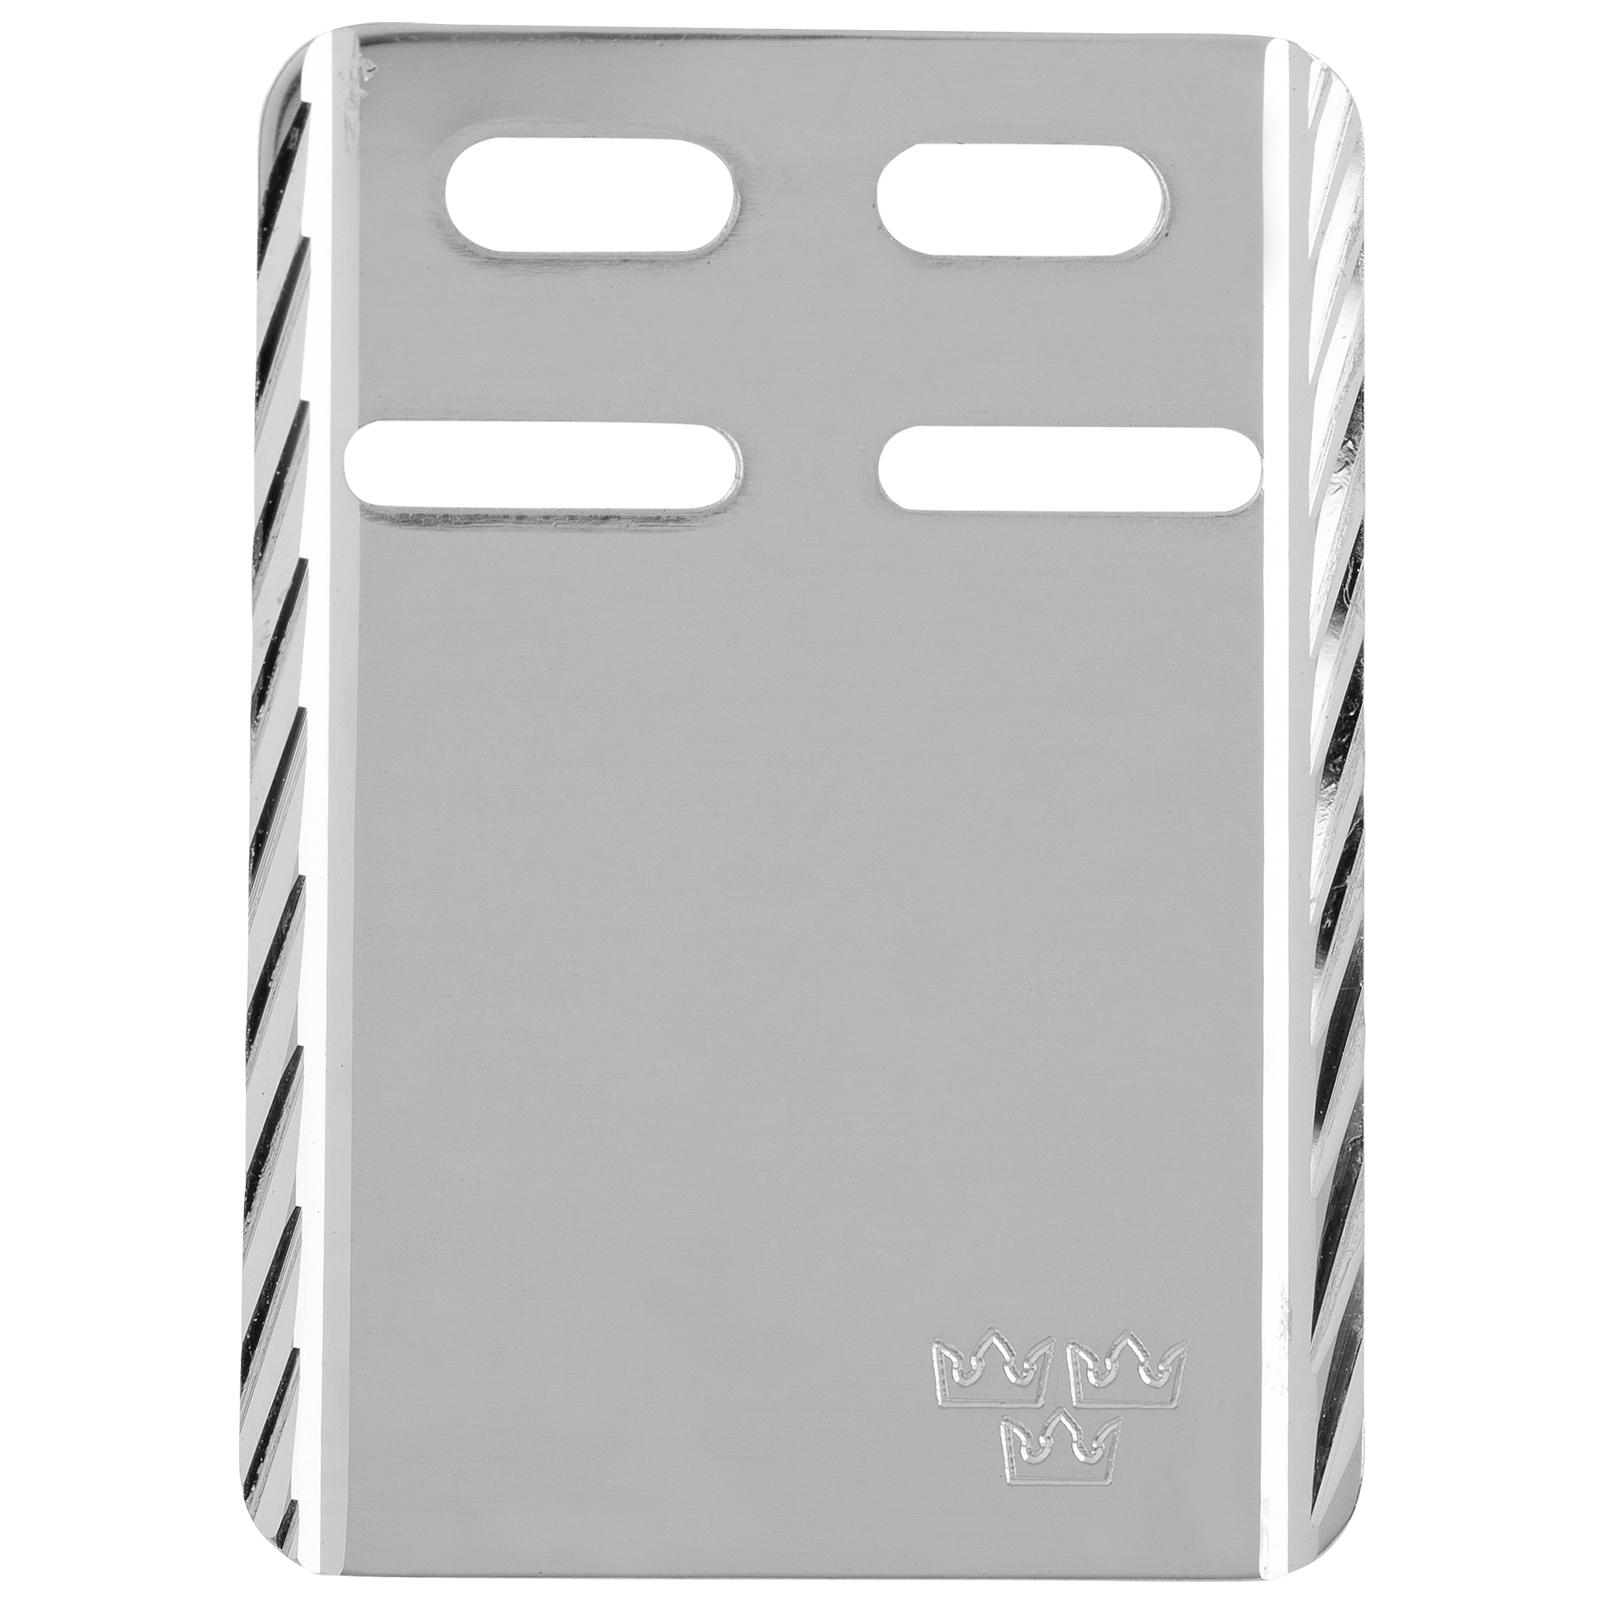 Berlock Silver ID-Bricka 19 mm